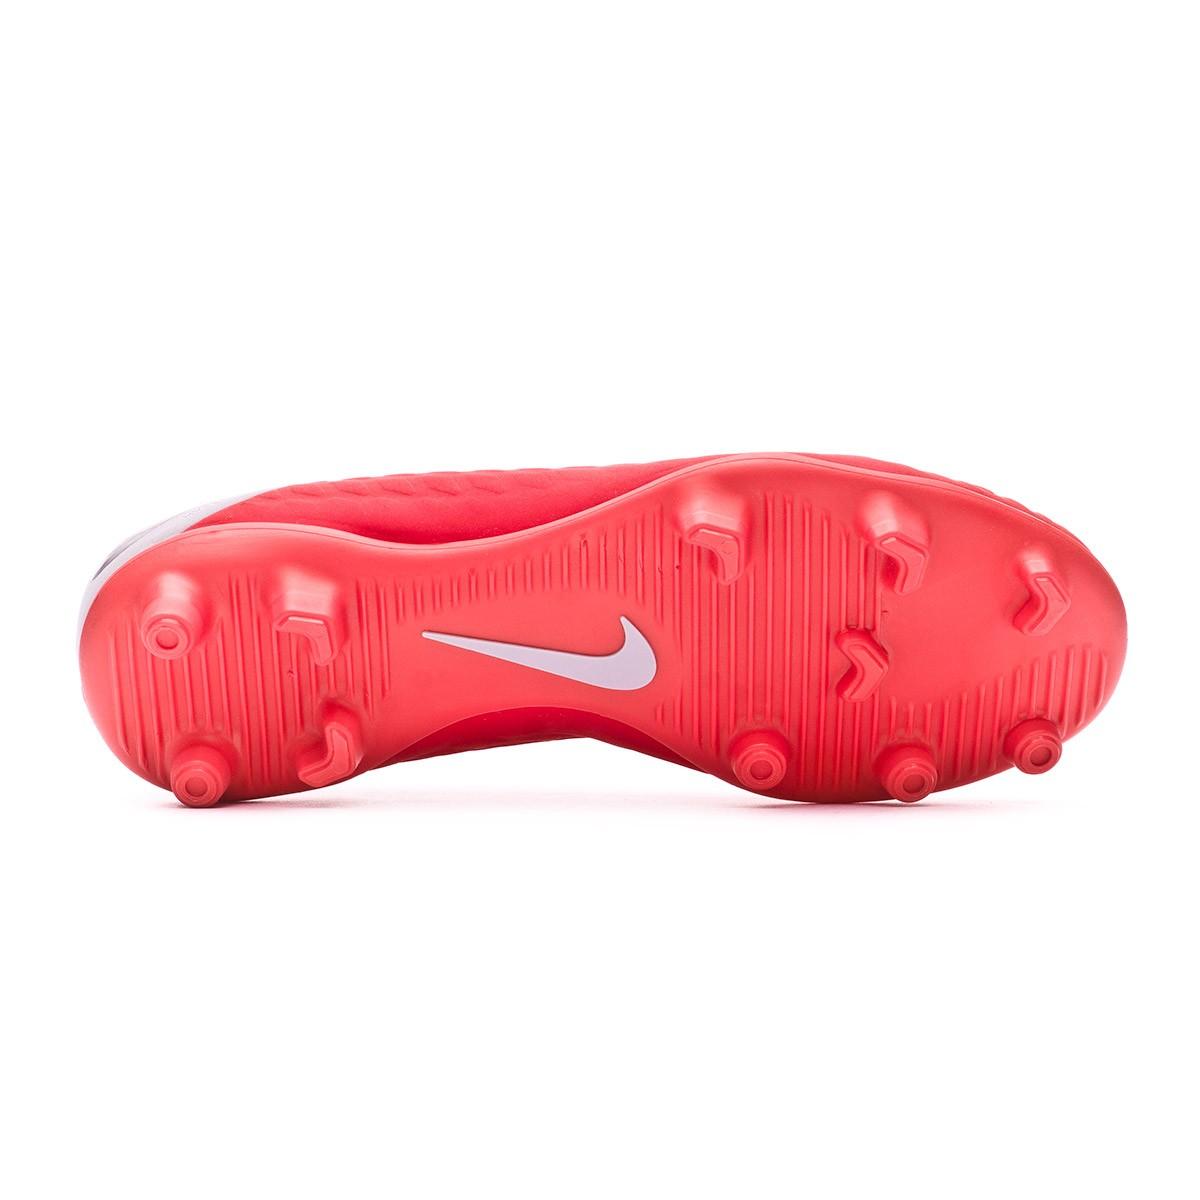 28bc537286bf Football Boots Nike Kids Hypervenom Phantom III Club FG Light crimson-Metallic  dark grey-Wolf grey - Tienda de fútbol Fútbol Emotion